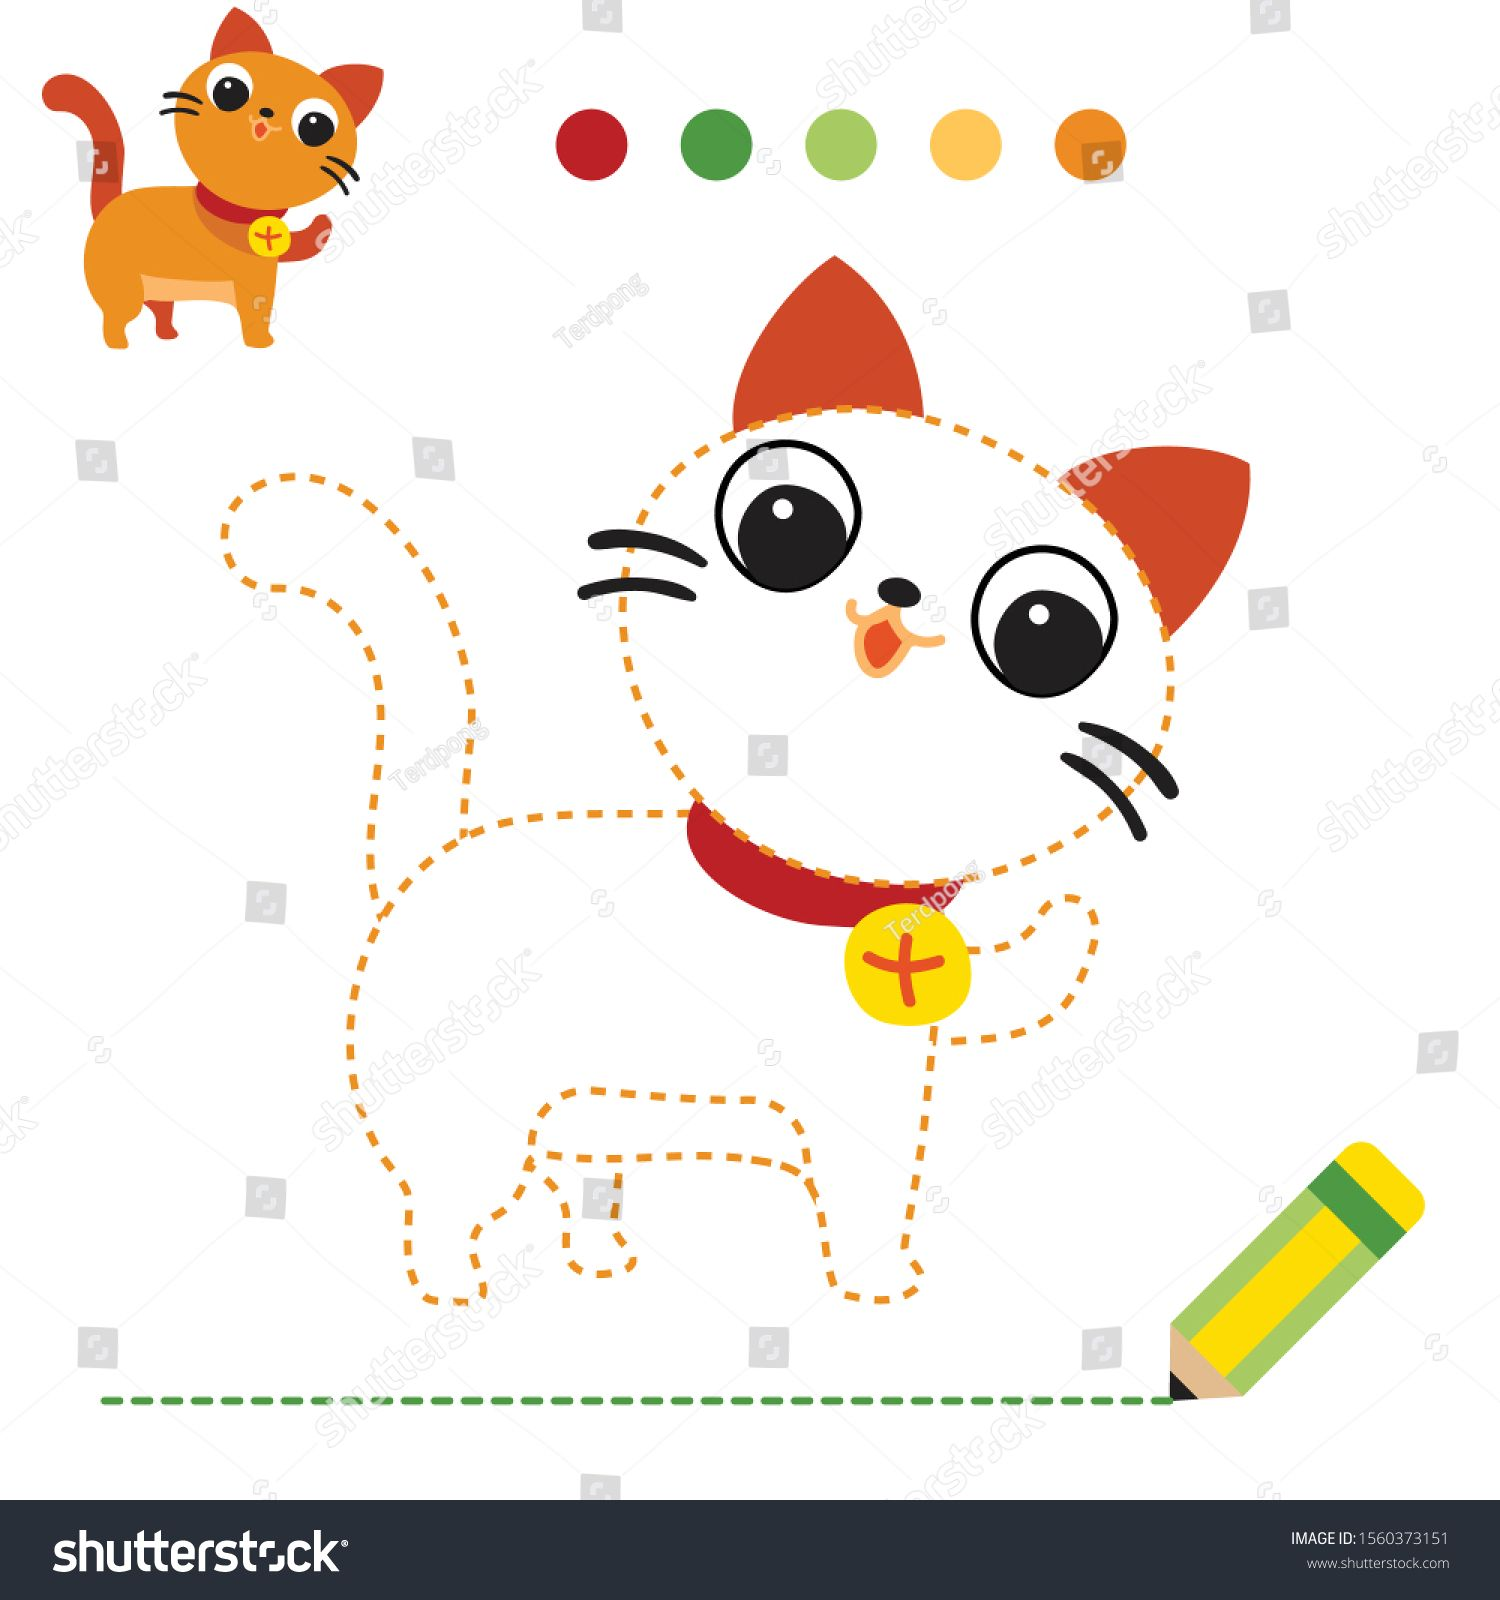 Cat Worksheet Vector Design Dash Game